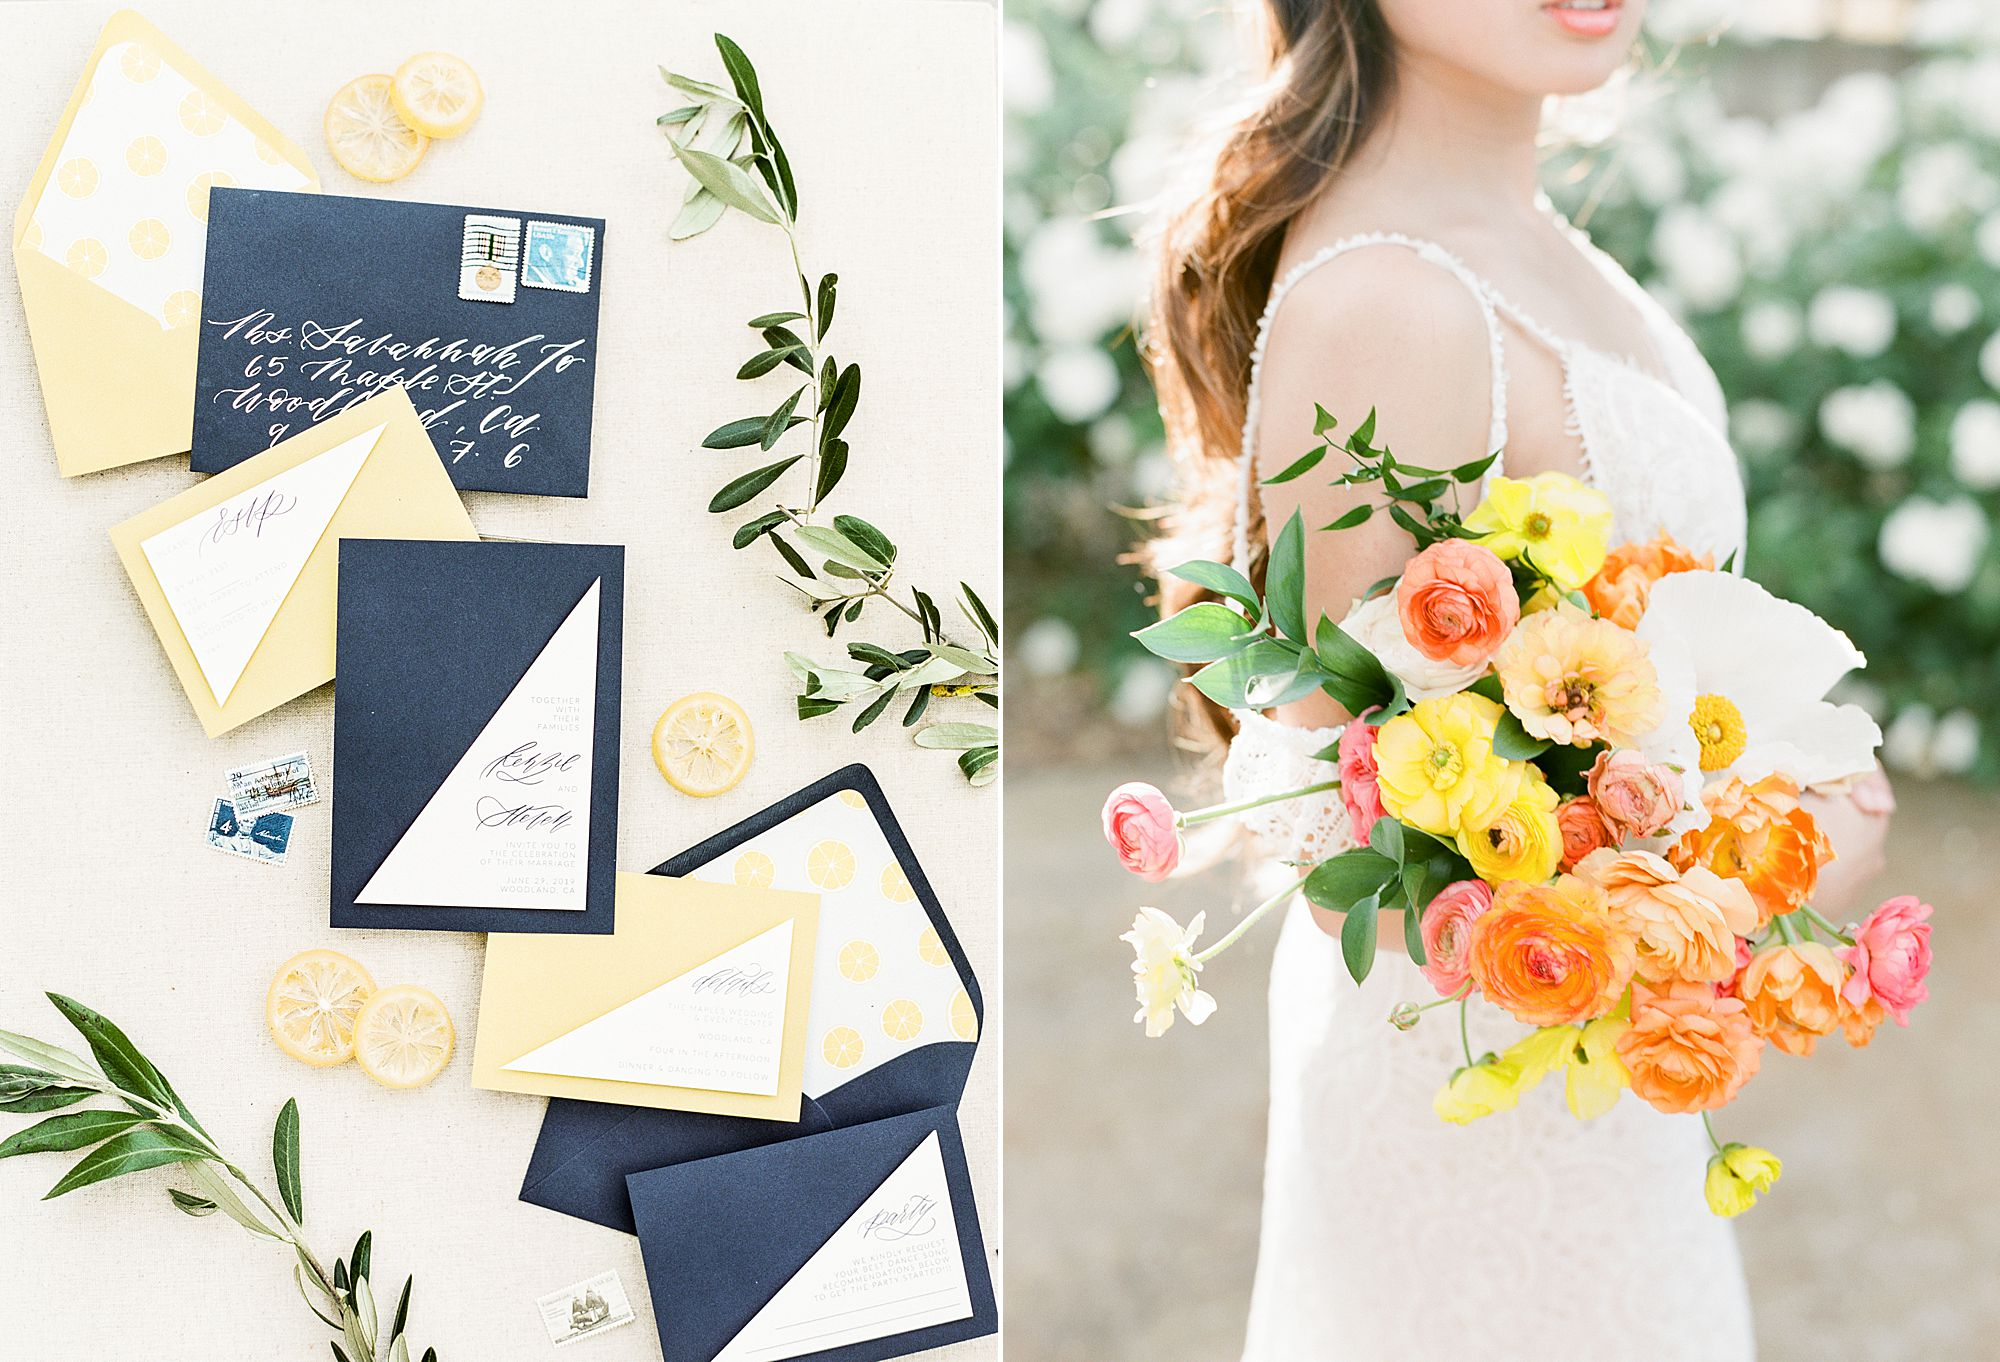 Italian Wedding Inspiration at The Maples Wedding & Event Center - Featured on Wedding Chicks - Ashley Baumgartner - Sacramento Wedding Phtoographer_0040.jpg